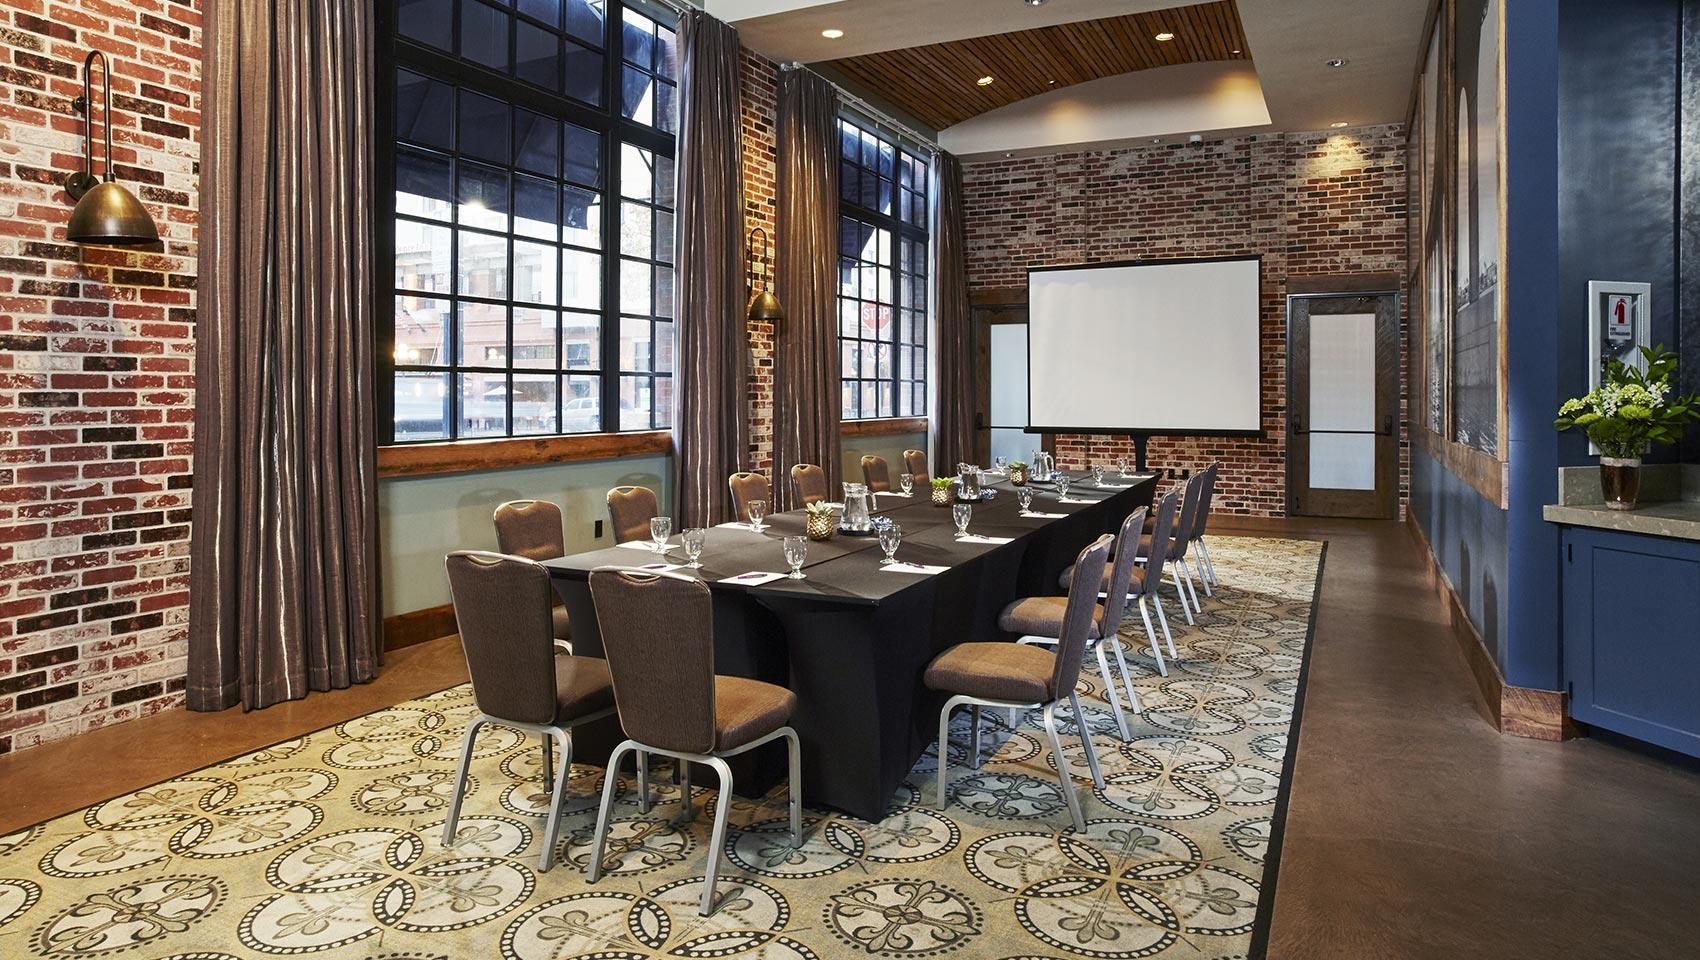 Vyral Marketing Workshop [for Real Estate Agents] | San Antonio, TX